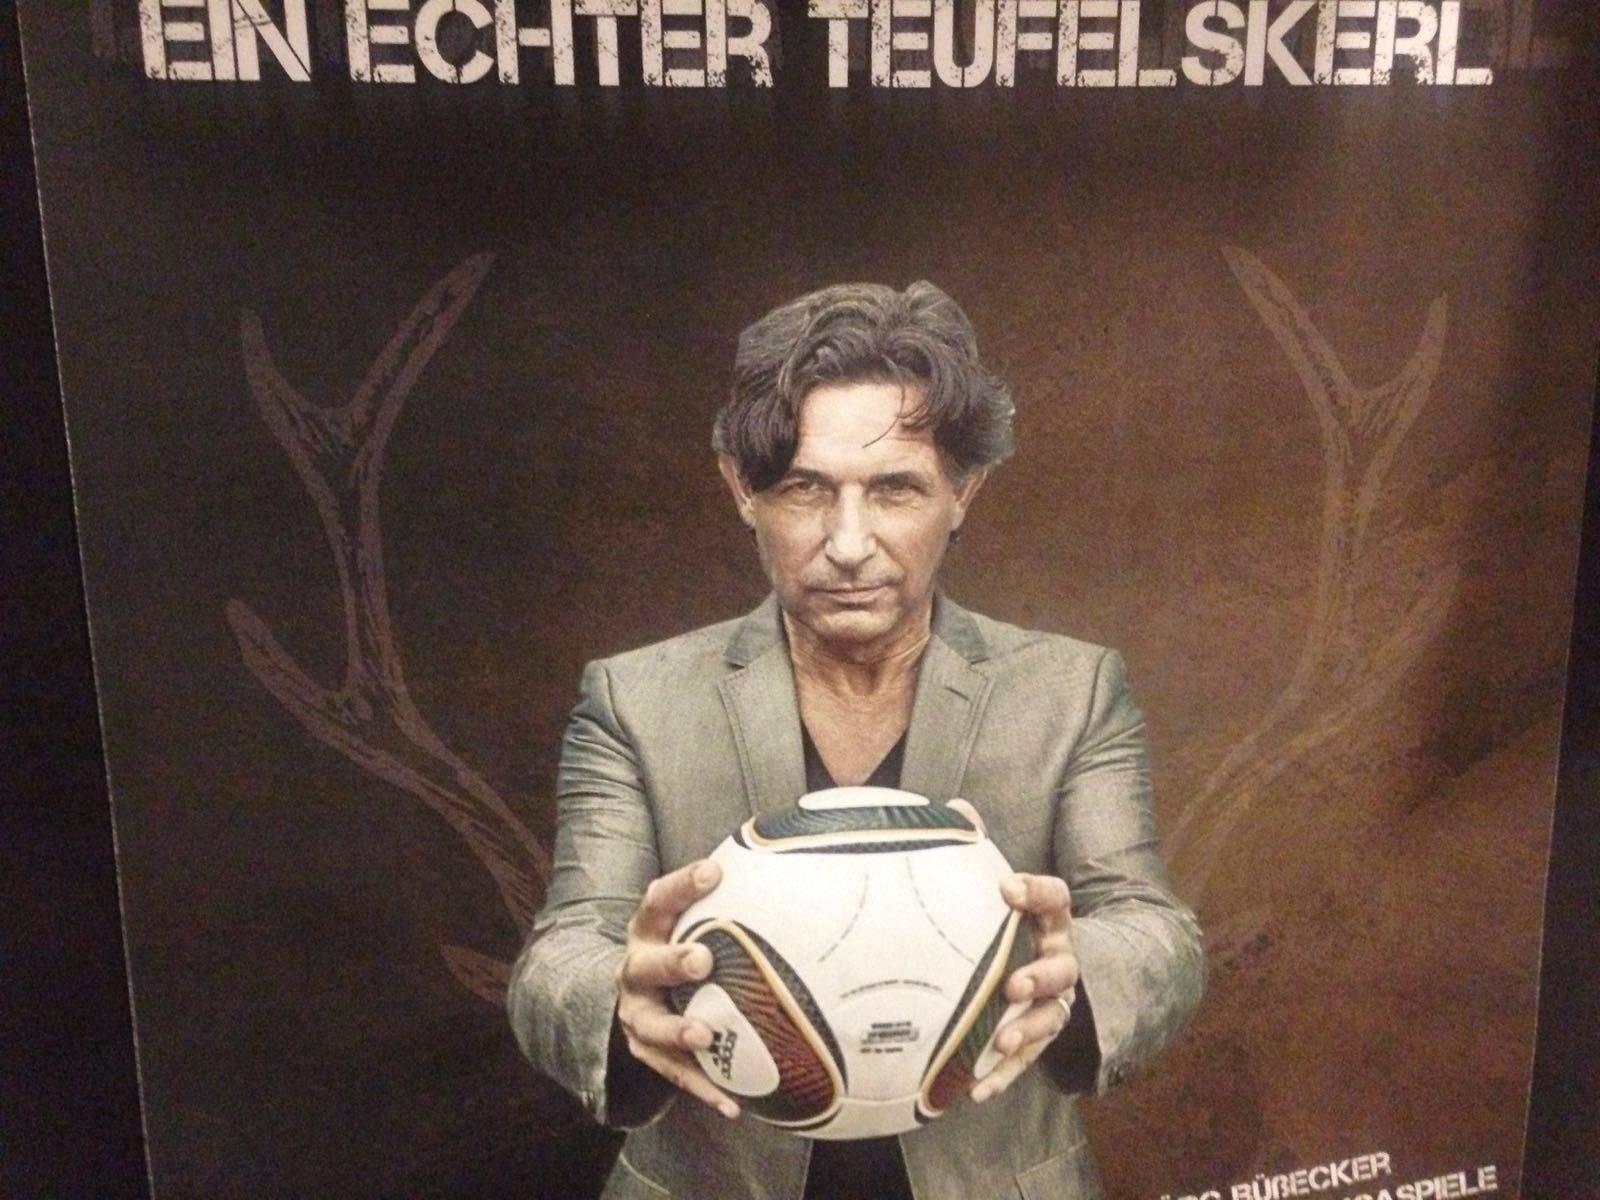 Simay Büssecker